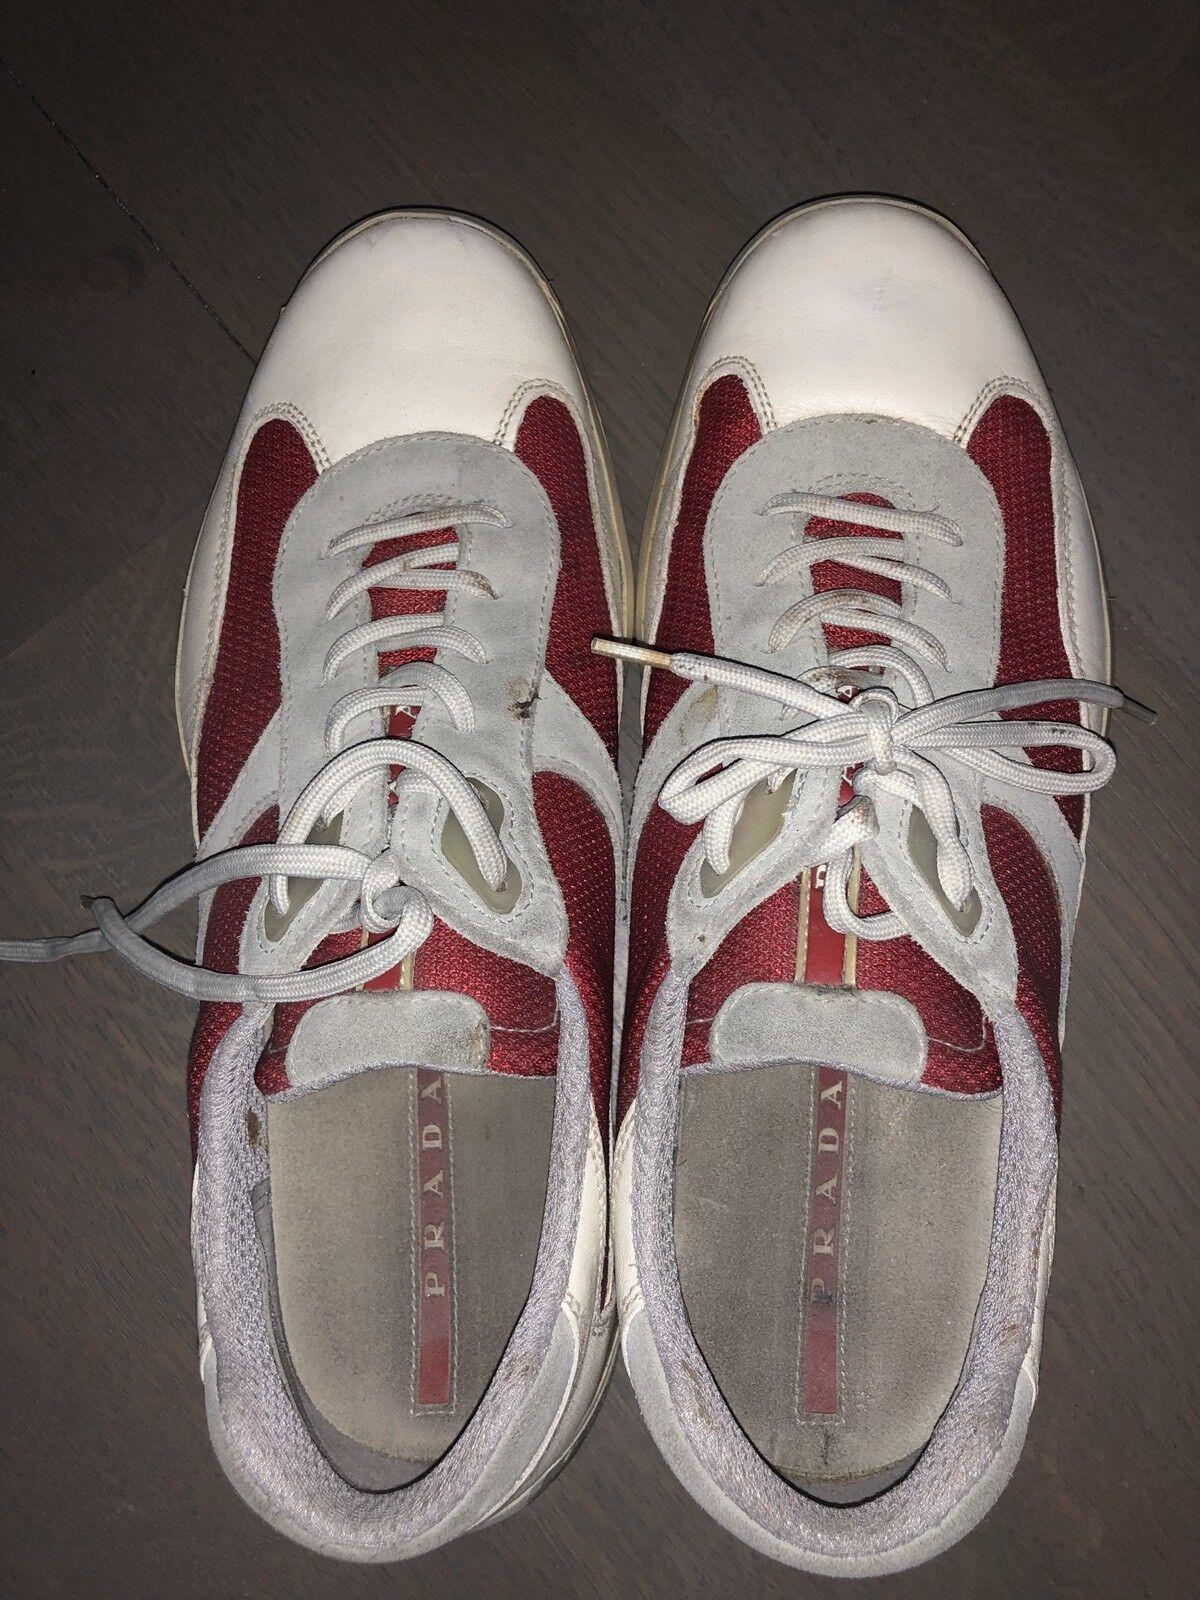 Prada Men's shoes - (Prada Size 7 1 2)